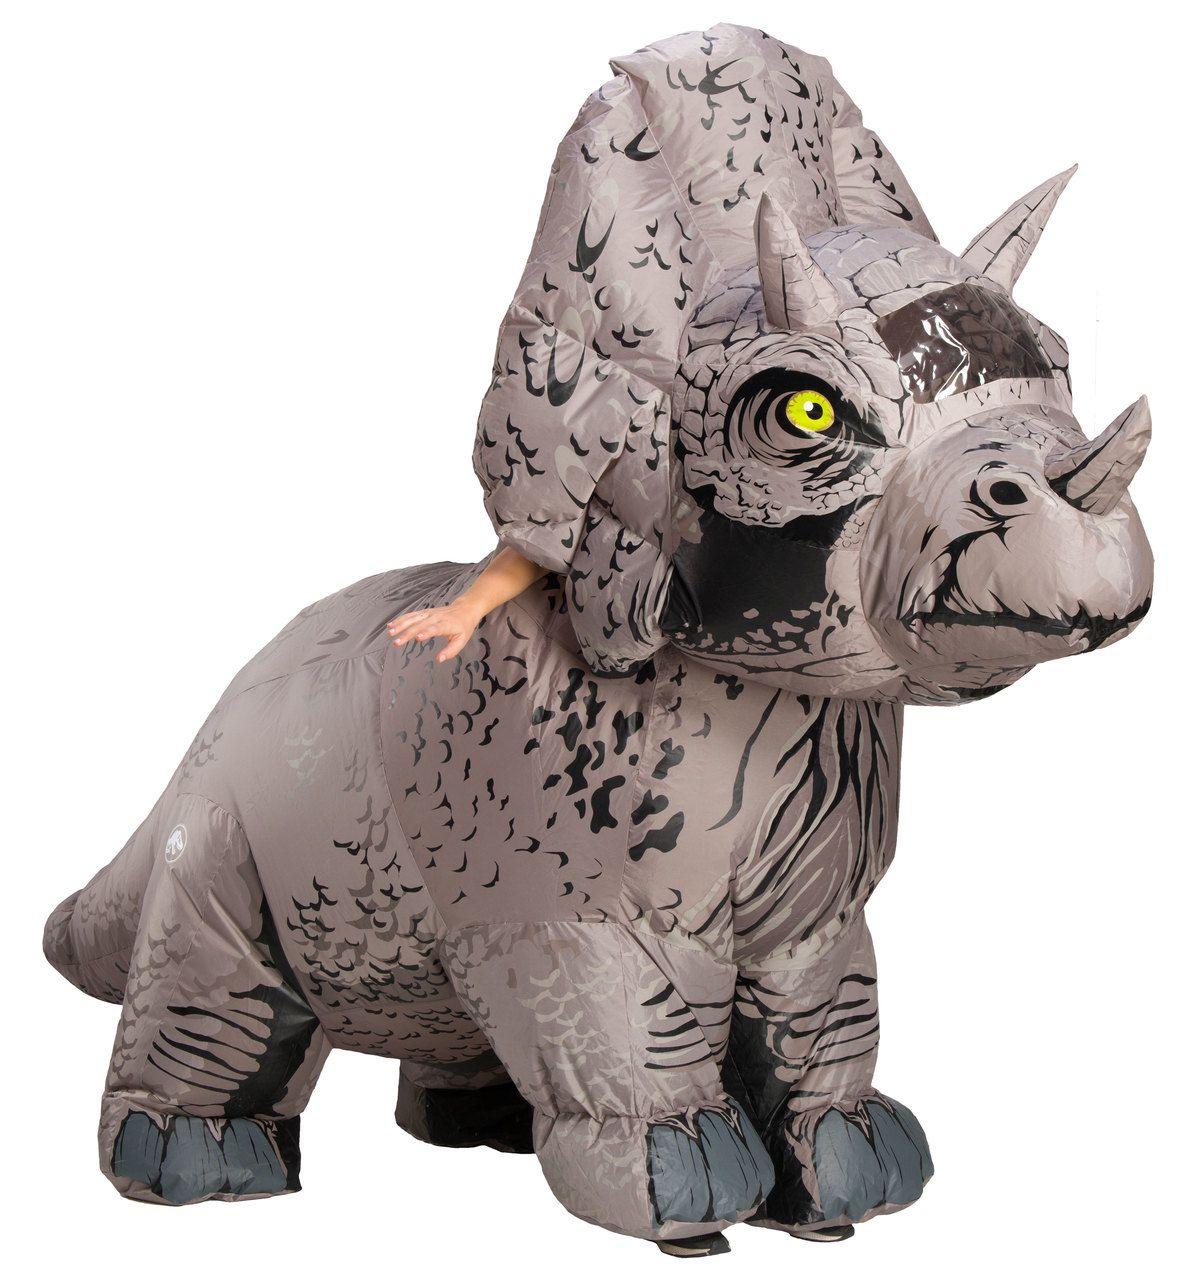 Fantasia Adulto Inflável Dinossauro Triceratops: Jurassic World - Rubies - CD